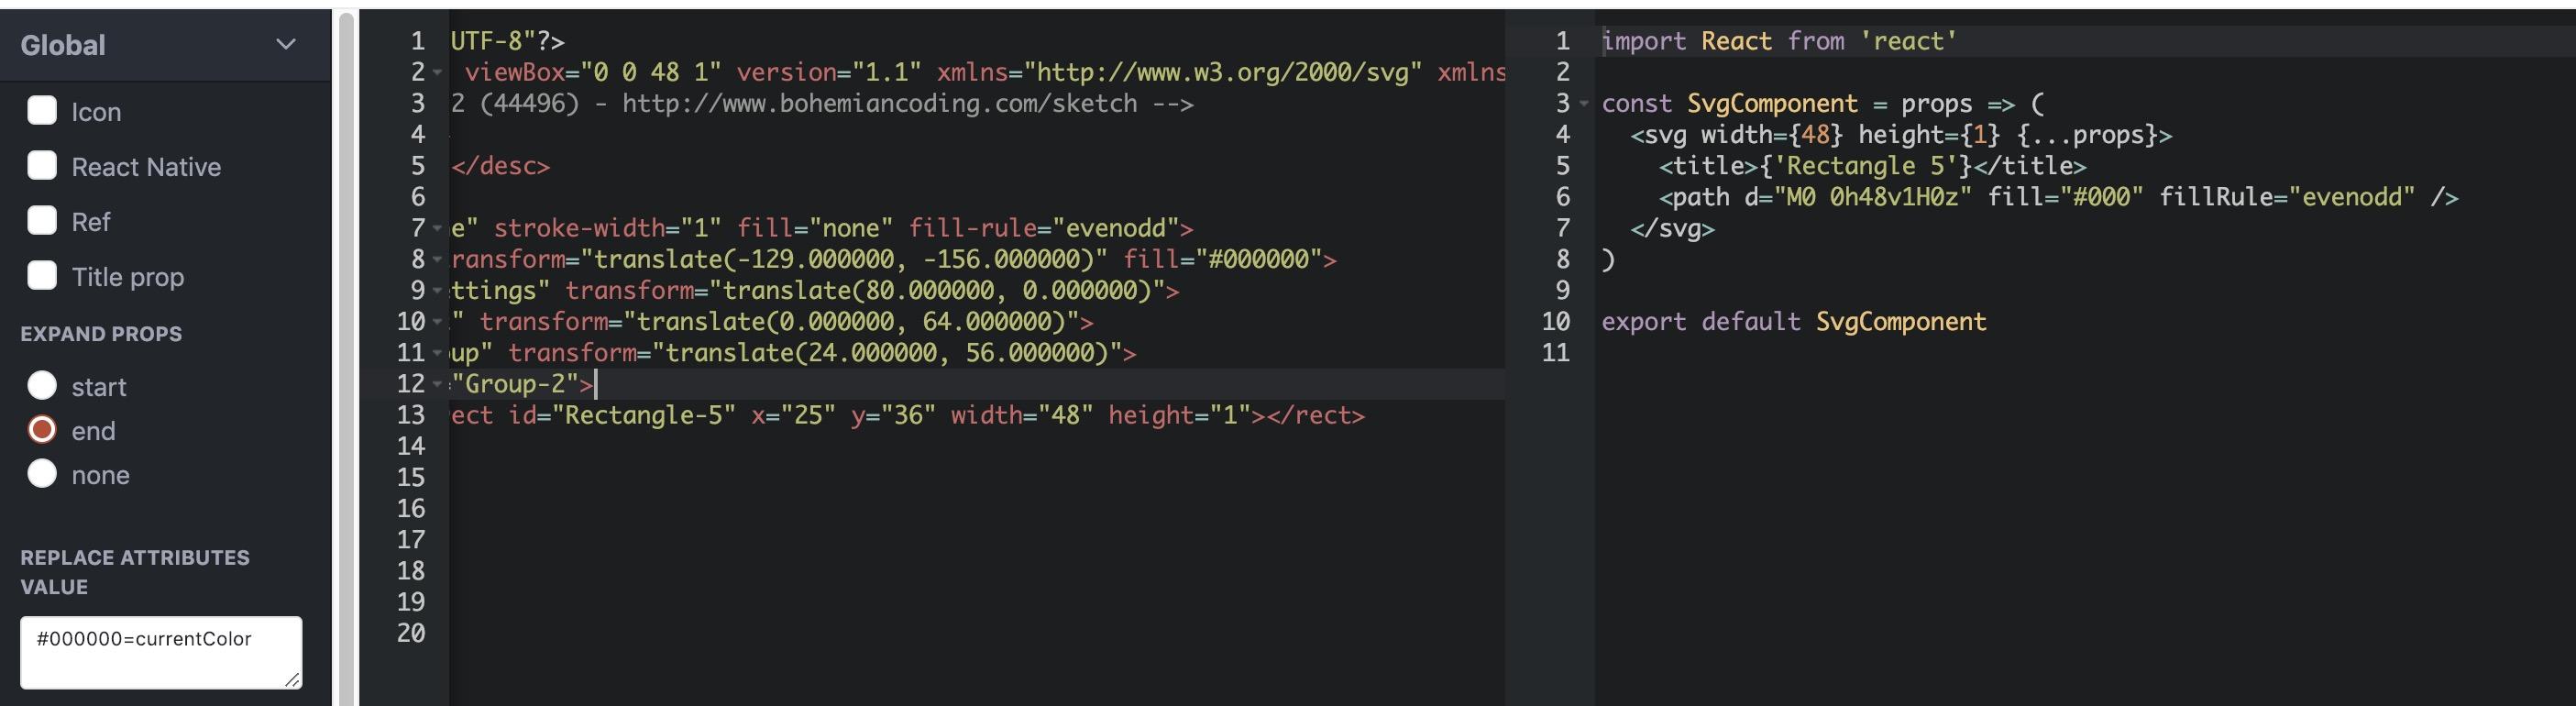 smooth-code - Bountysource